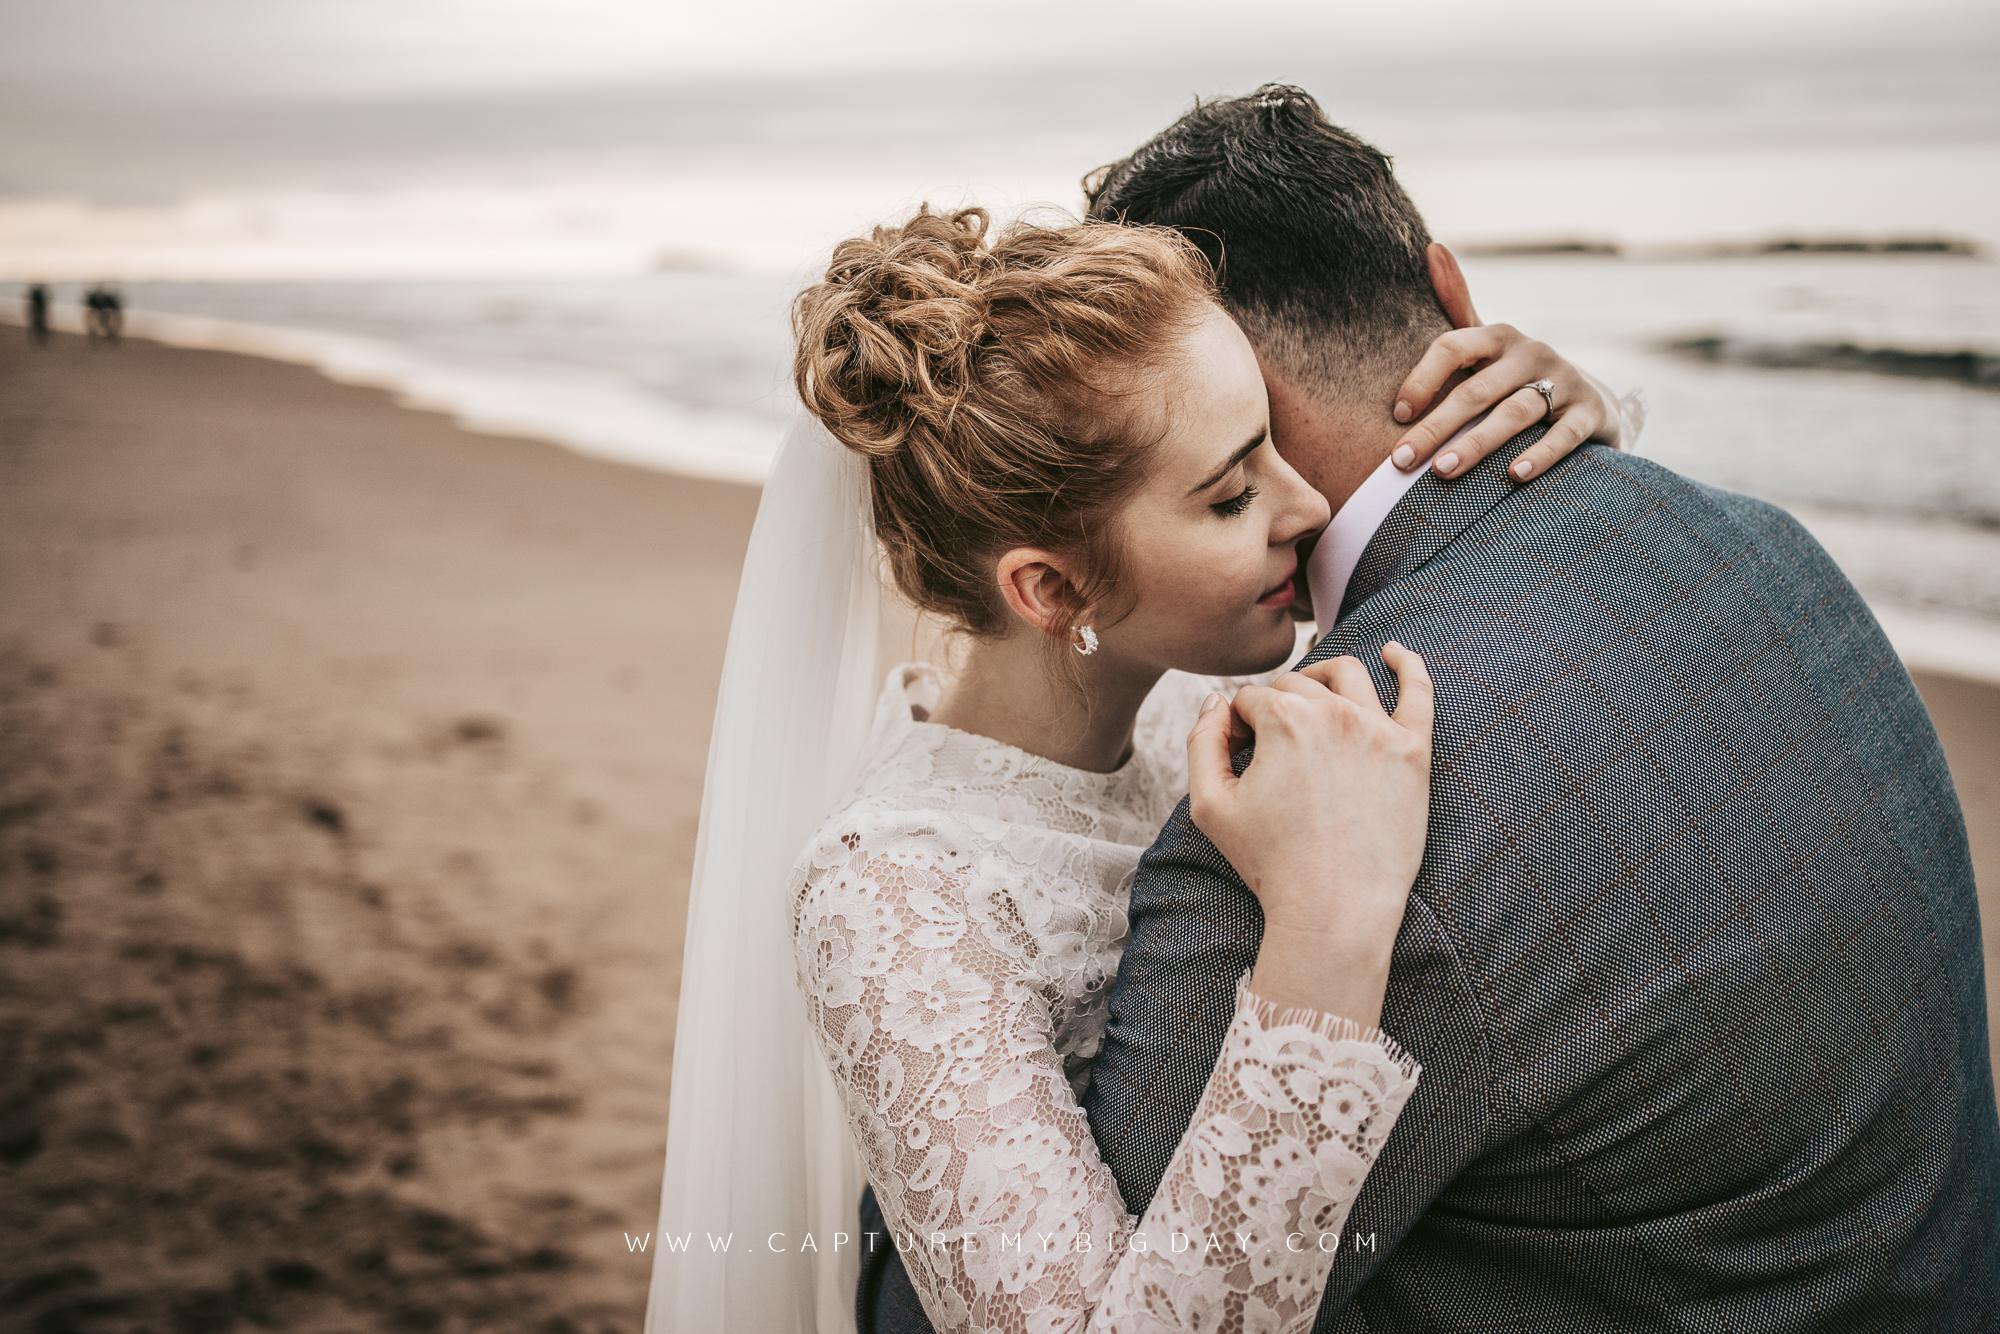 bride hugging the groom on the beach